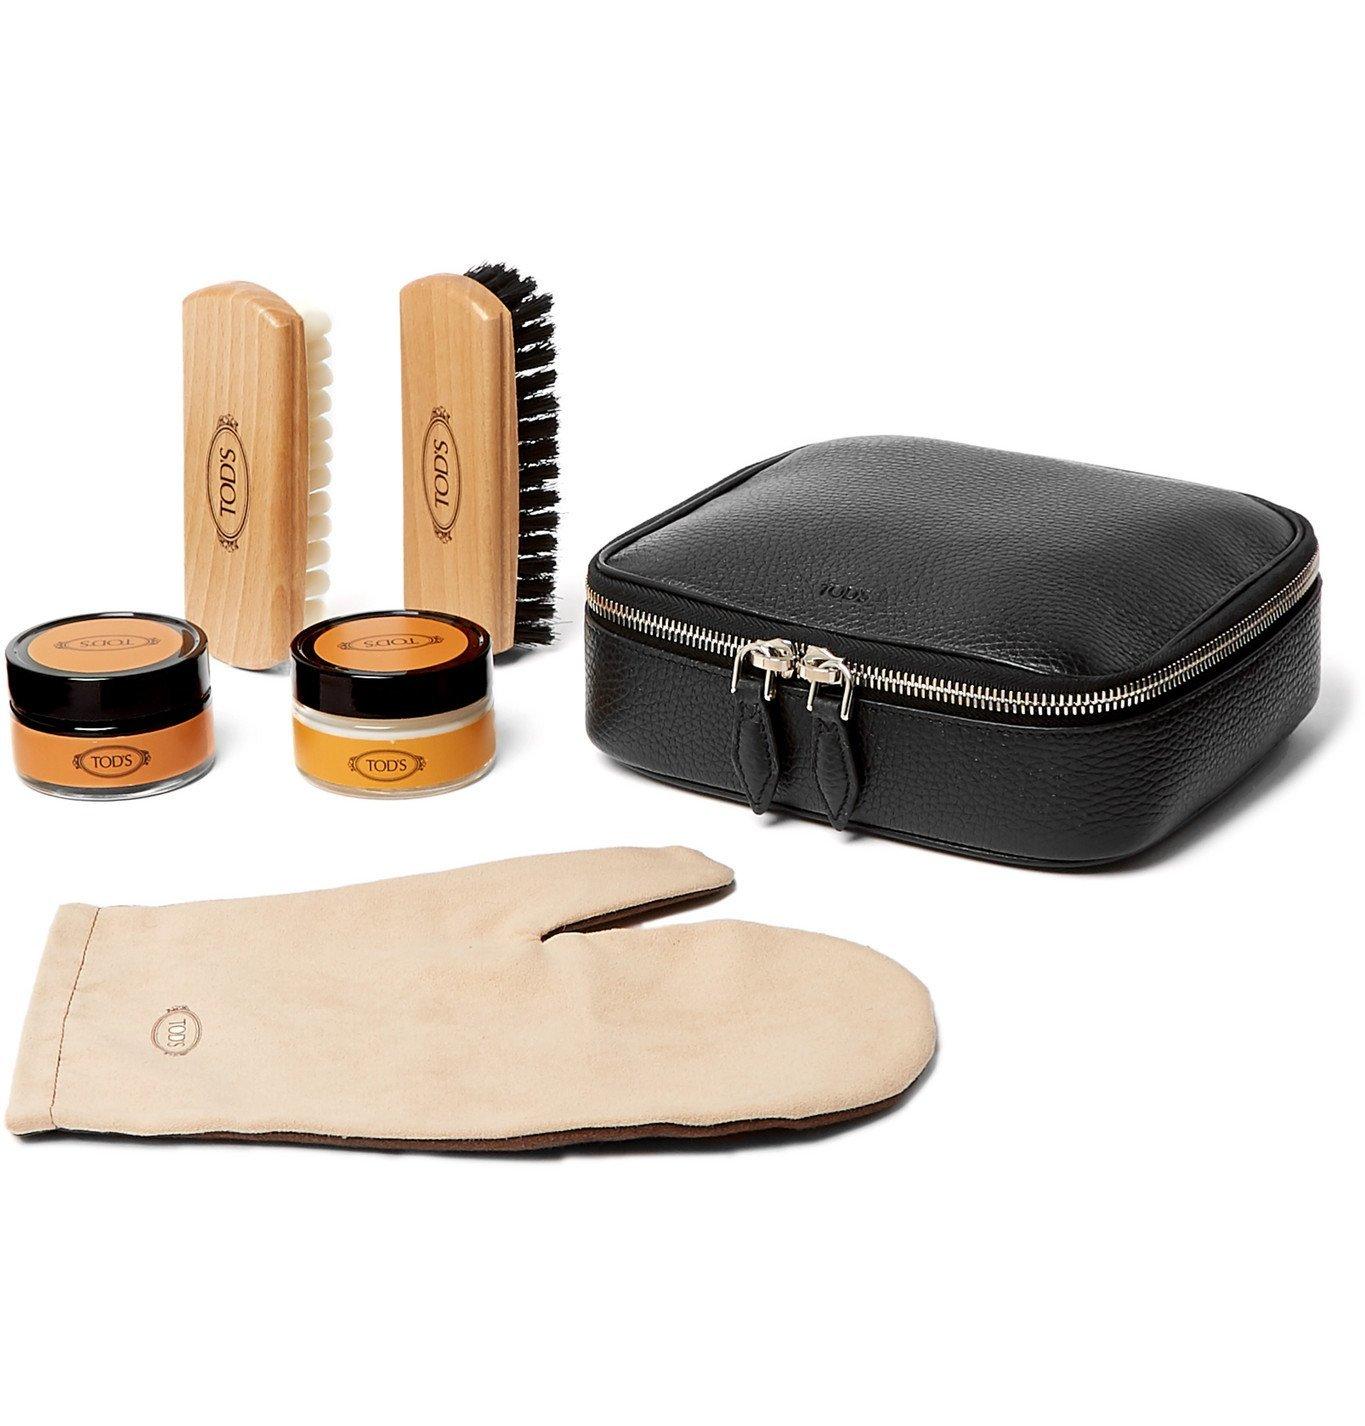 Tod's - Full-Grain Leather Shoe Care Kit - Black